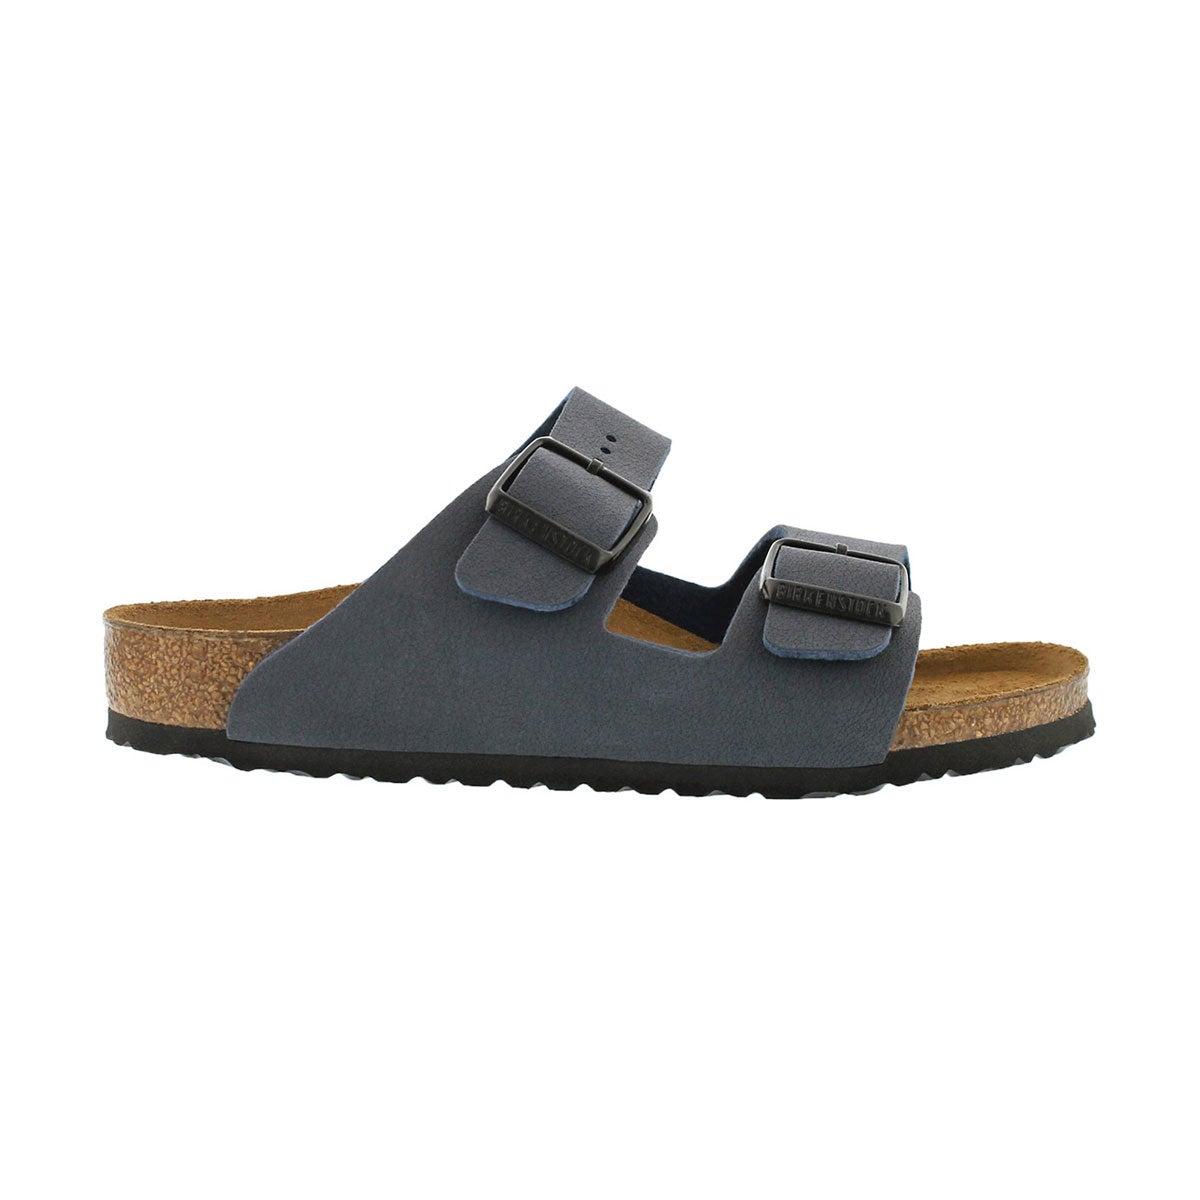 Sandales BF ARIZONA, marine, enfants - Étroites